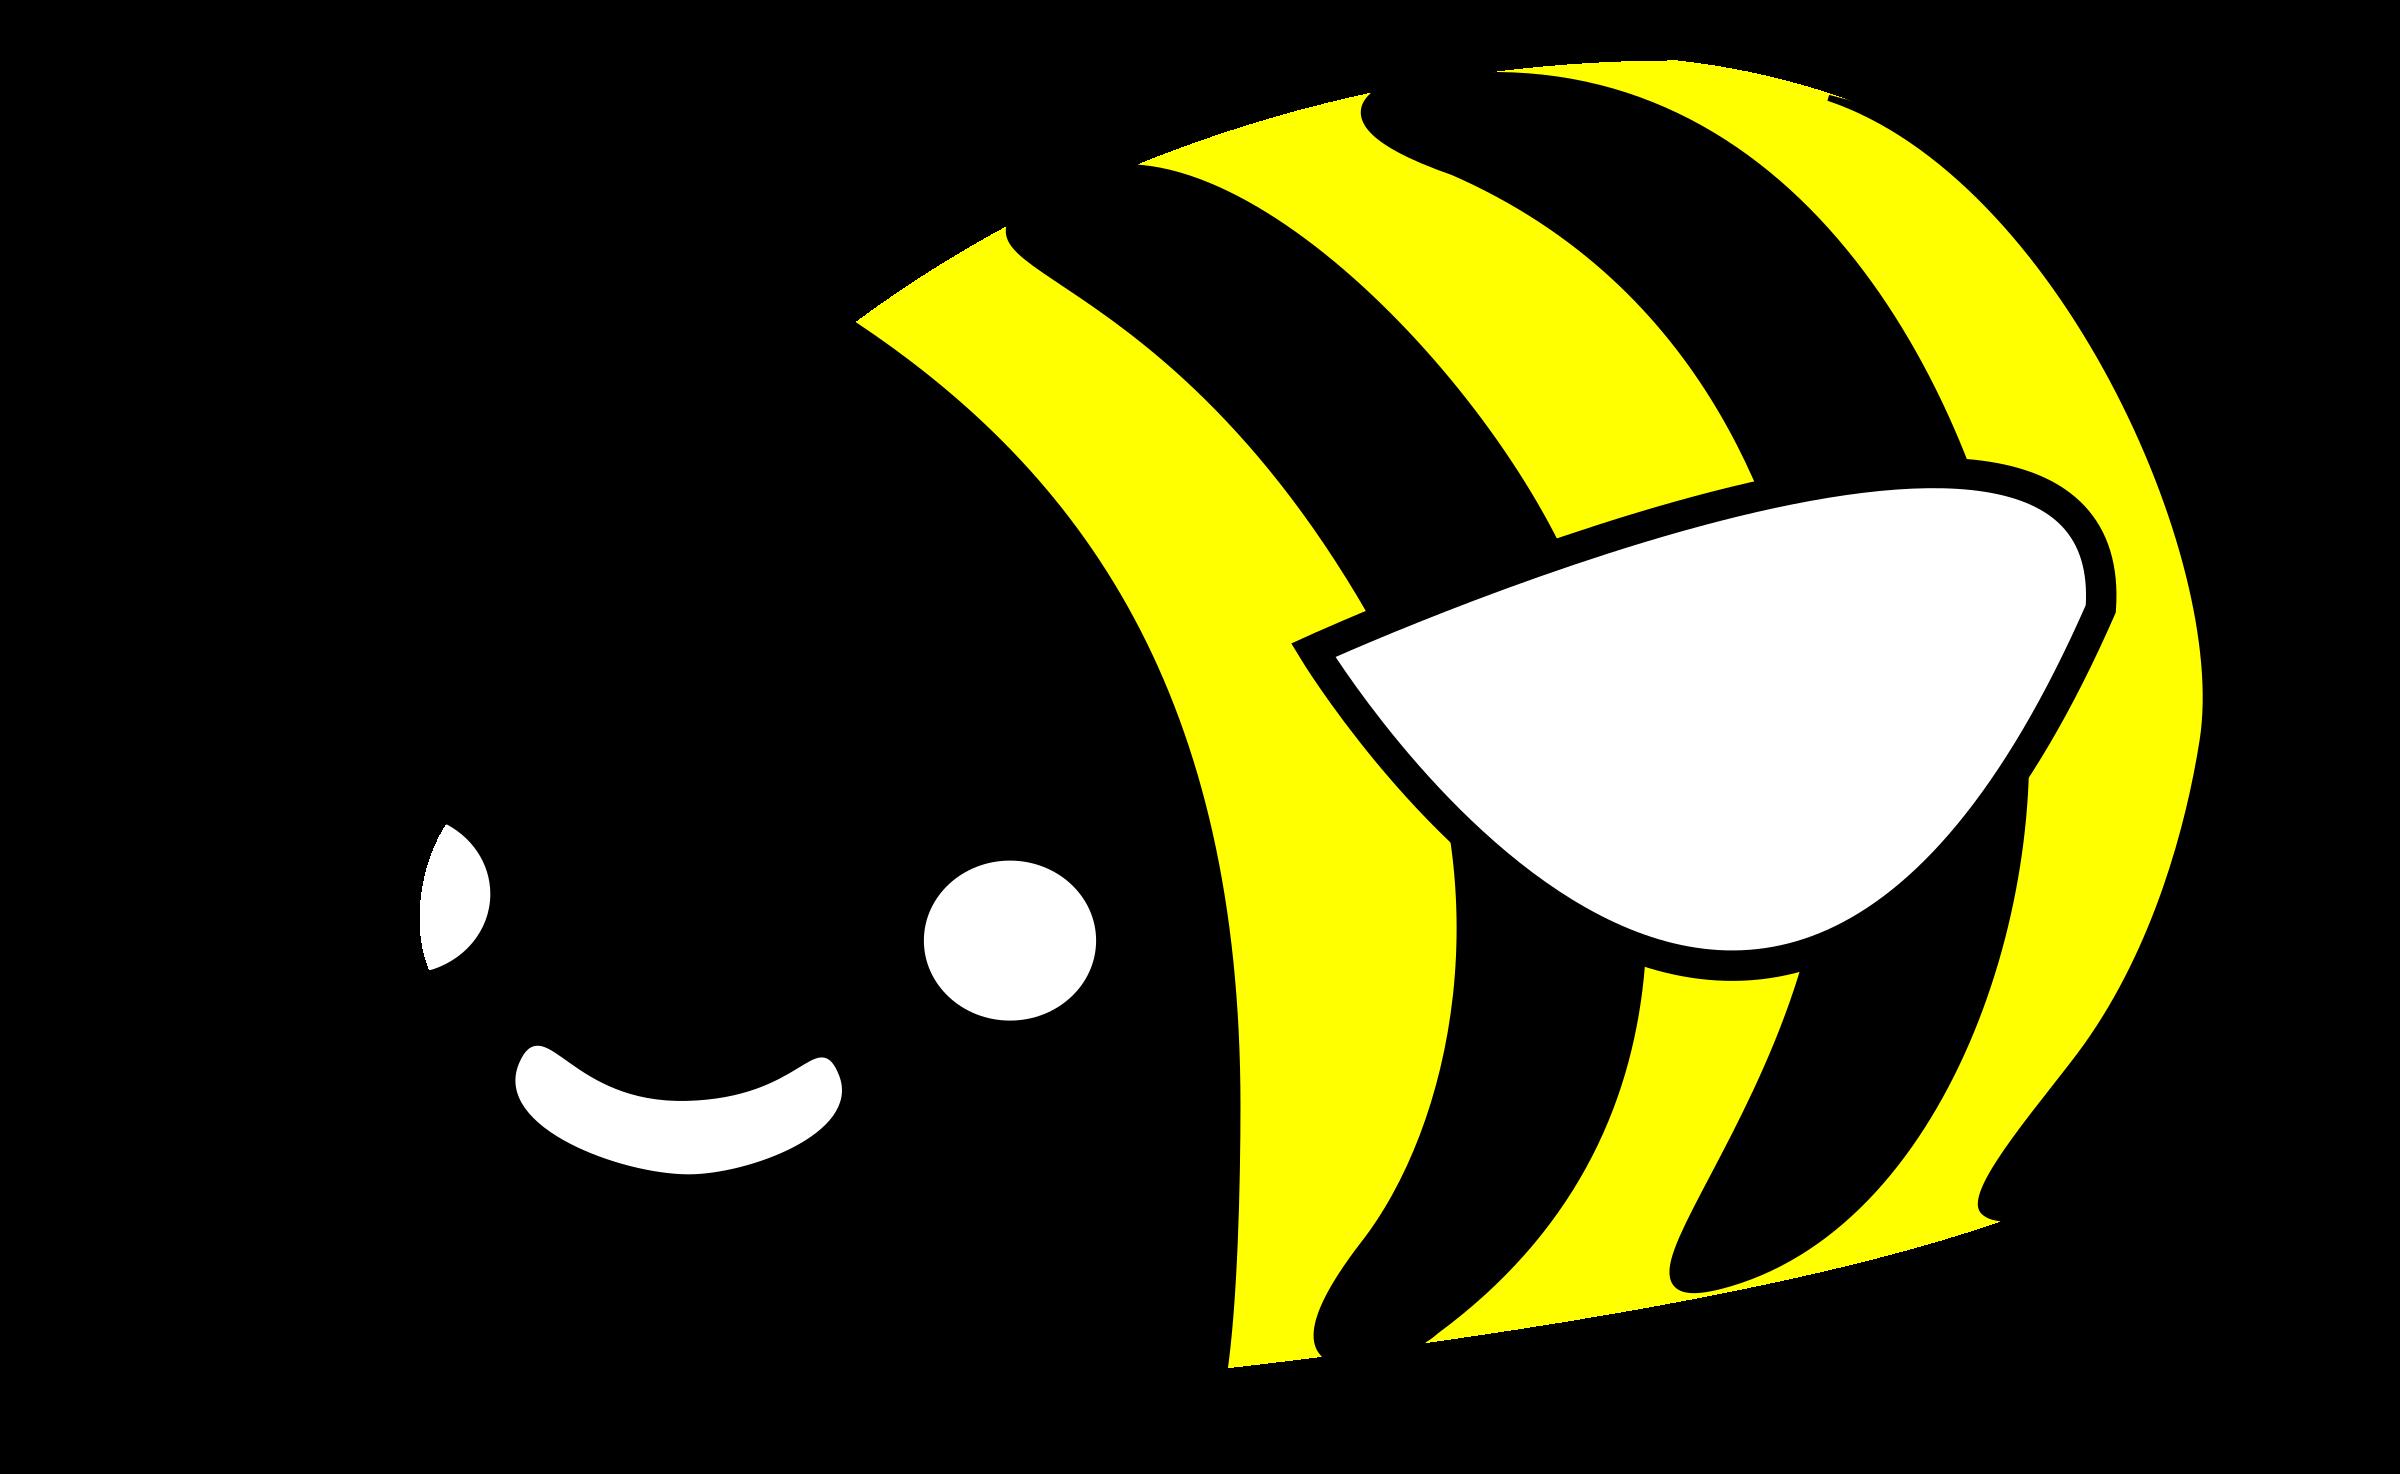 graphic download Bumblebee clipart kawaii. Cute bumble bee big.